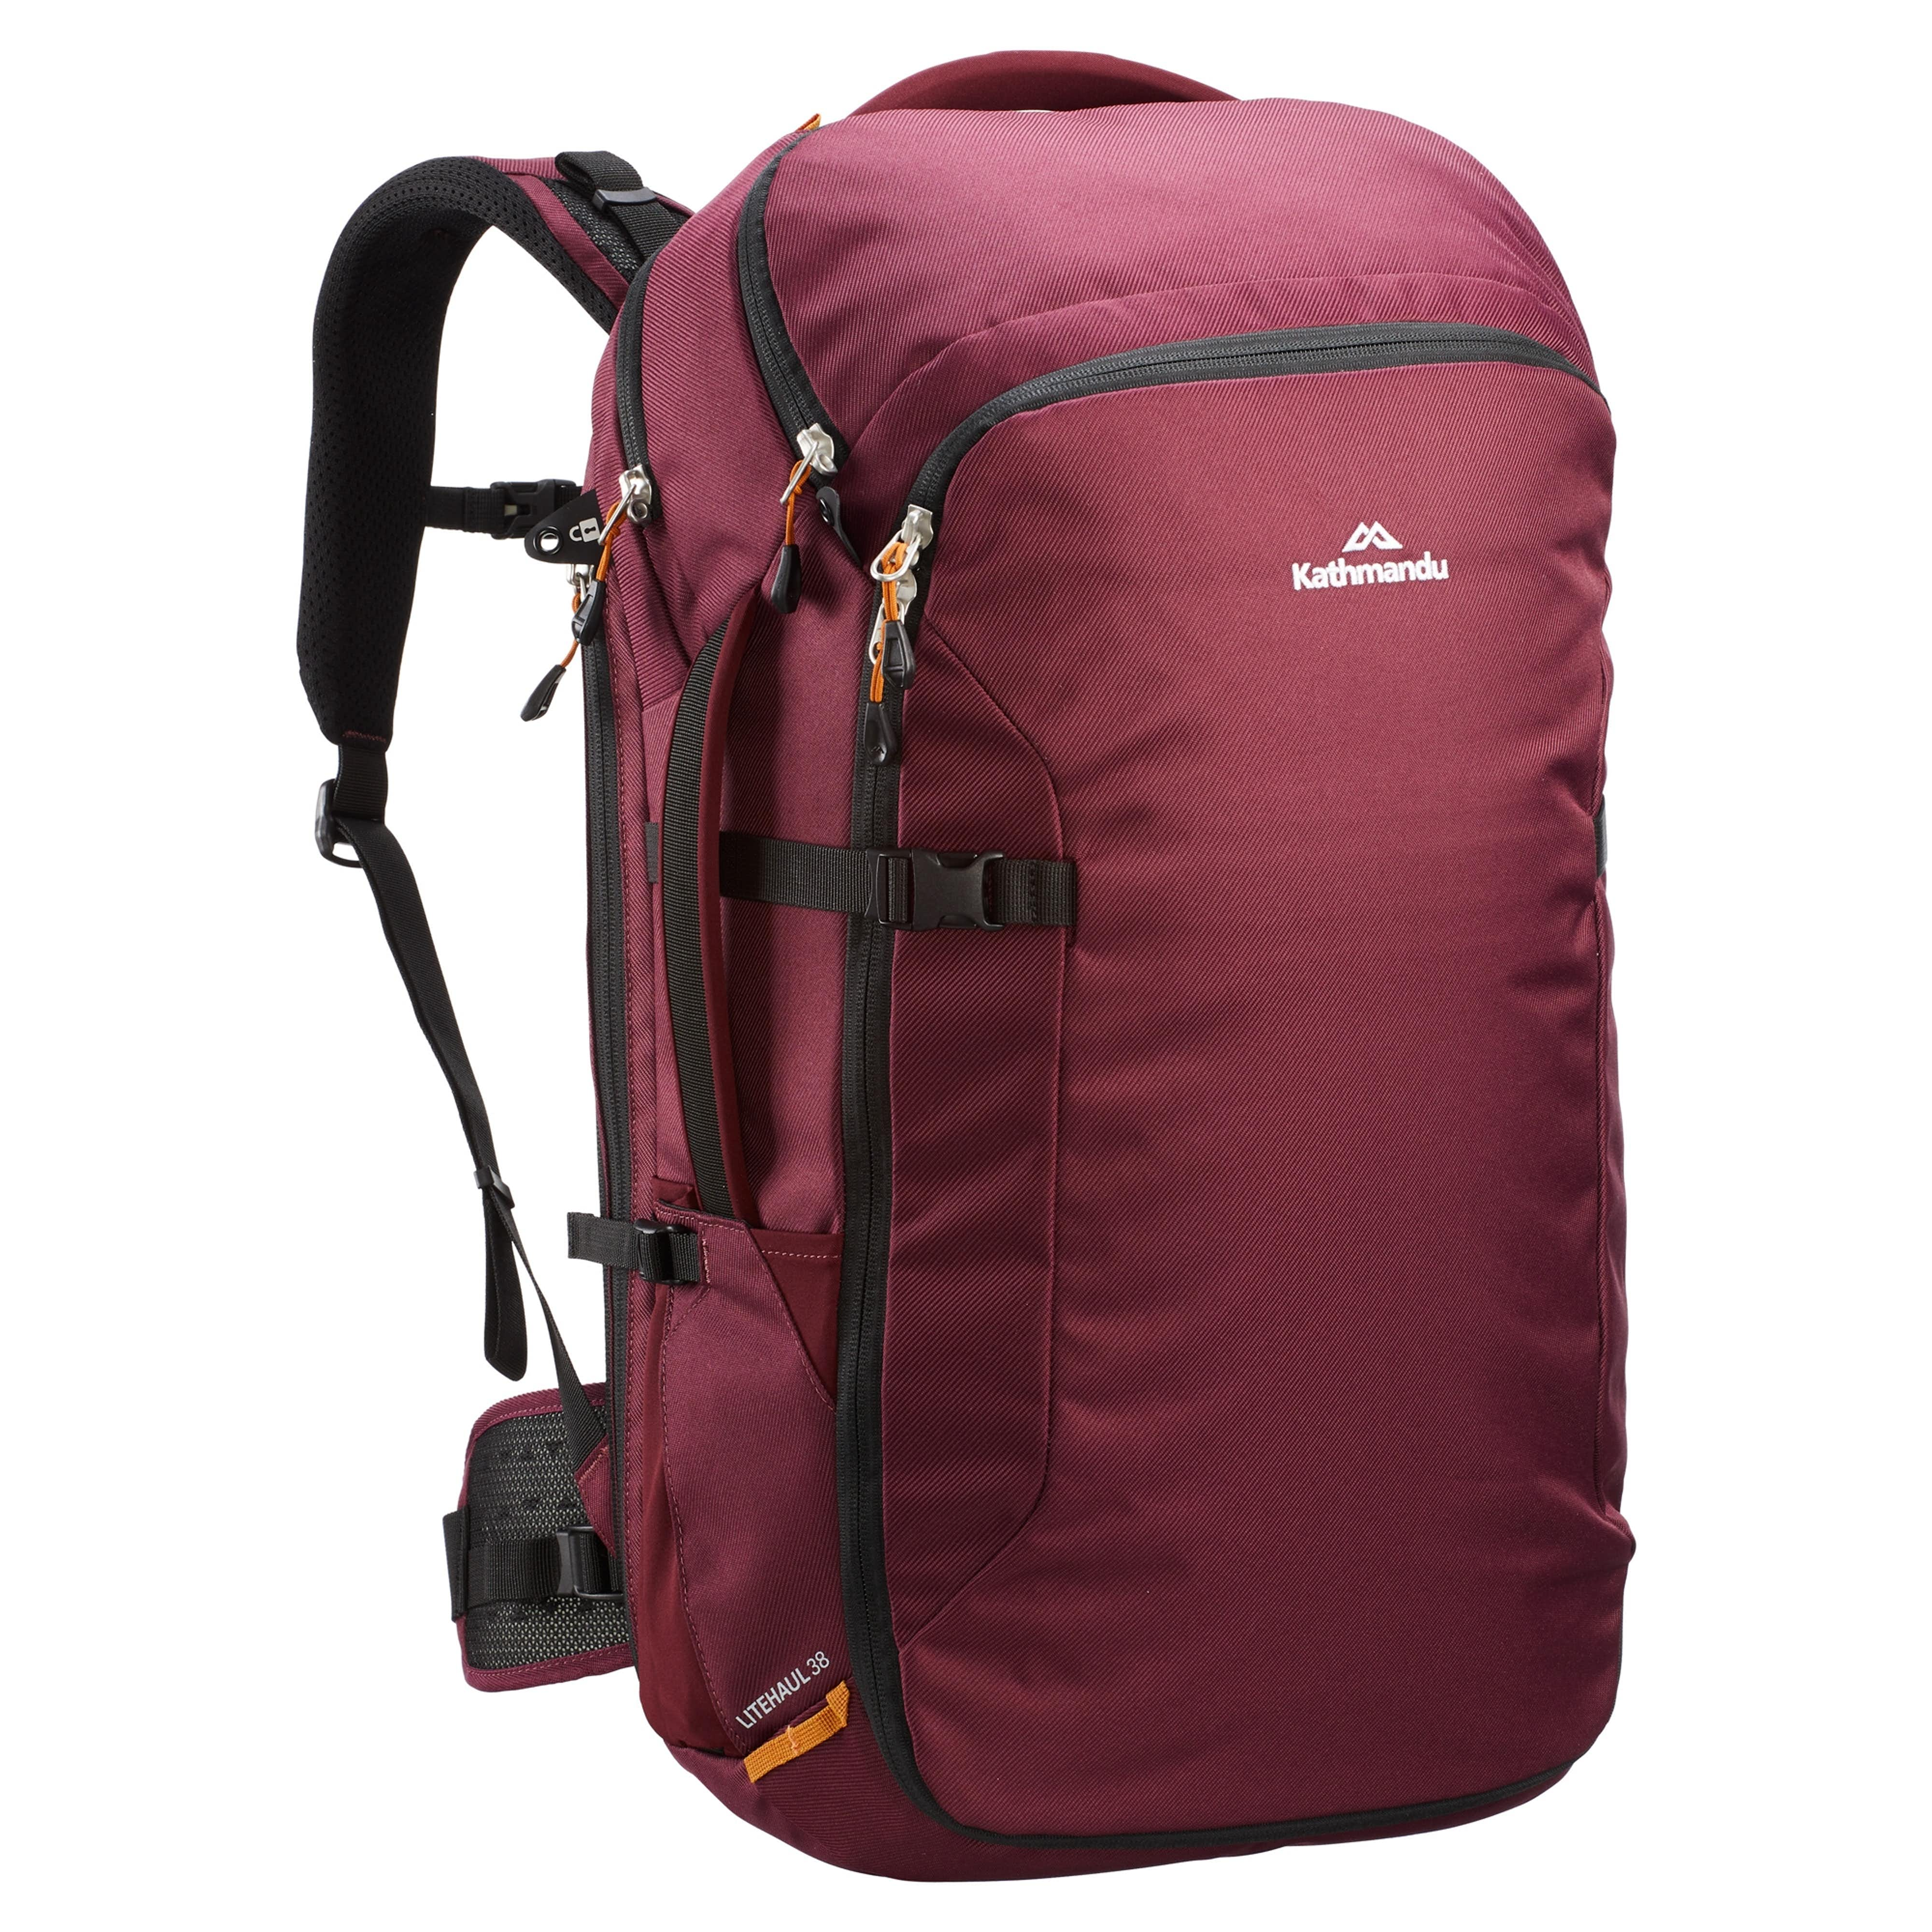 9e9f71a2a66 Travel Backpacks for Women   Men for Sale   Kathmandu Australia